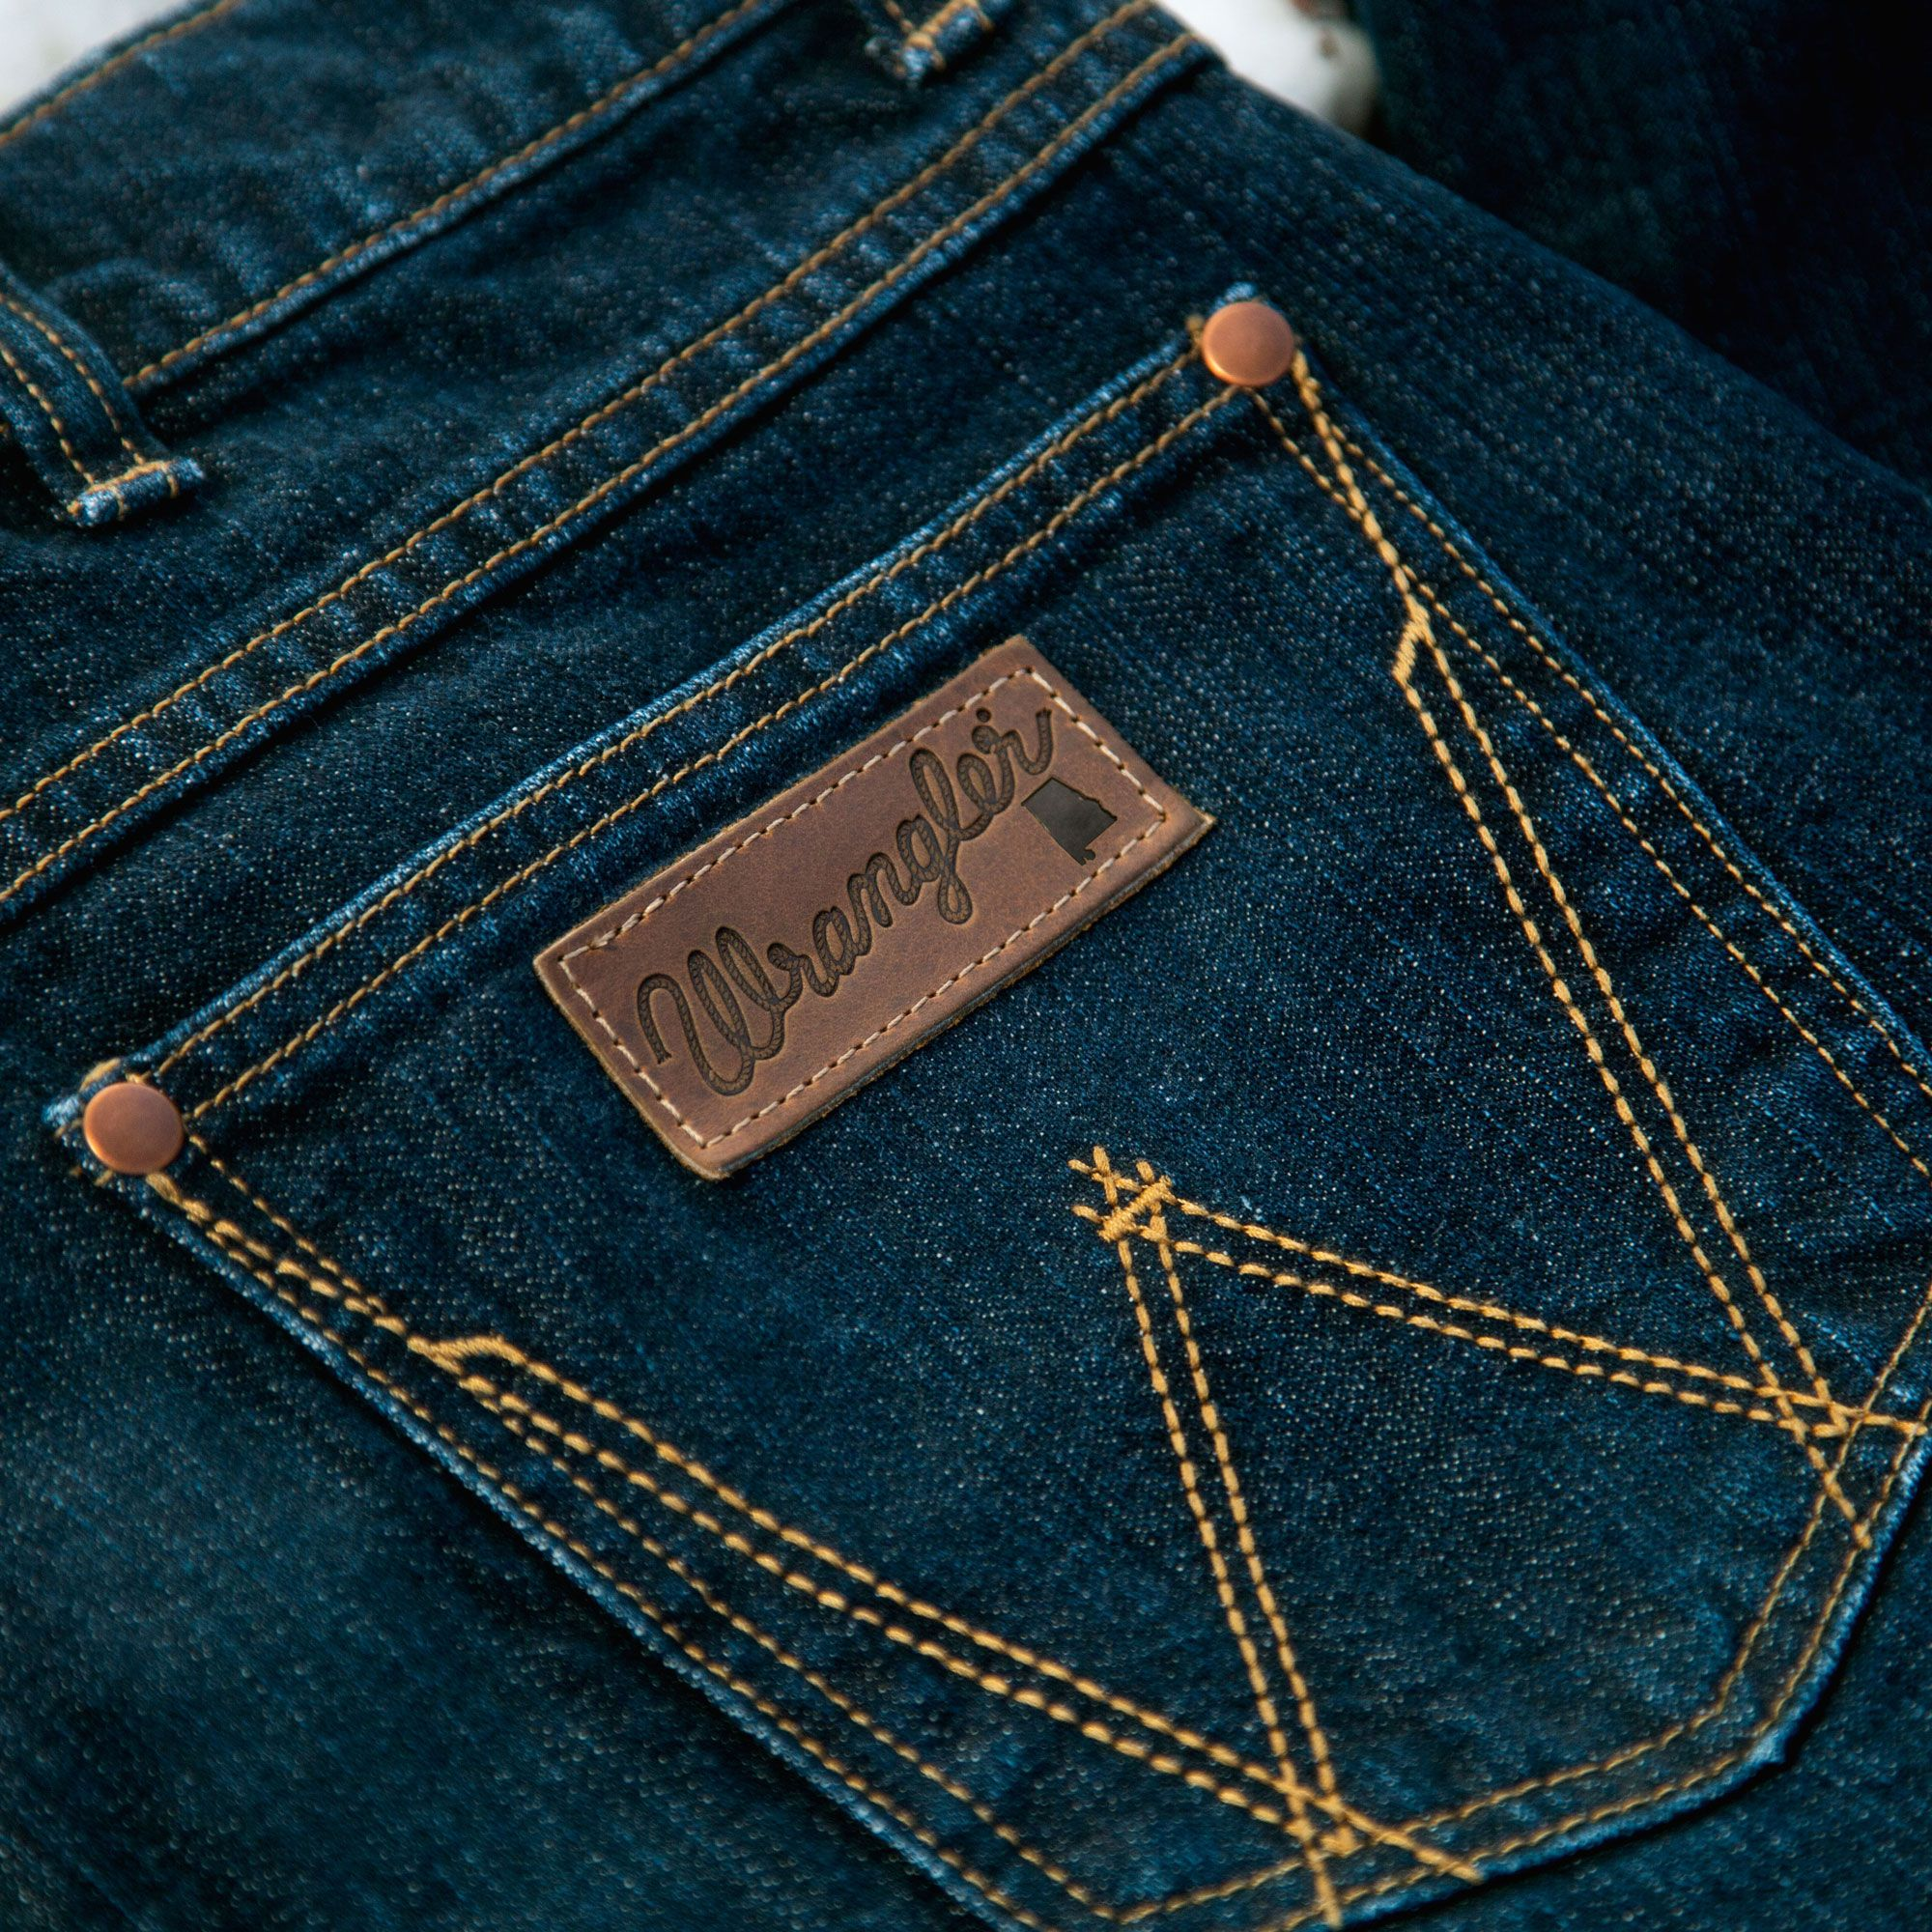 Men S Wrangler Rooted Collection Alabama Slim Fit Jean In Alabama Wash Denim Jeans Men Denim Shirt With Jeans Mens Fashion Denim